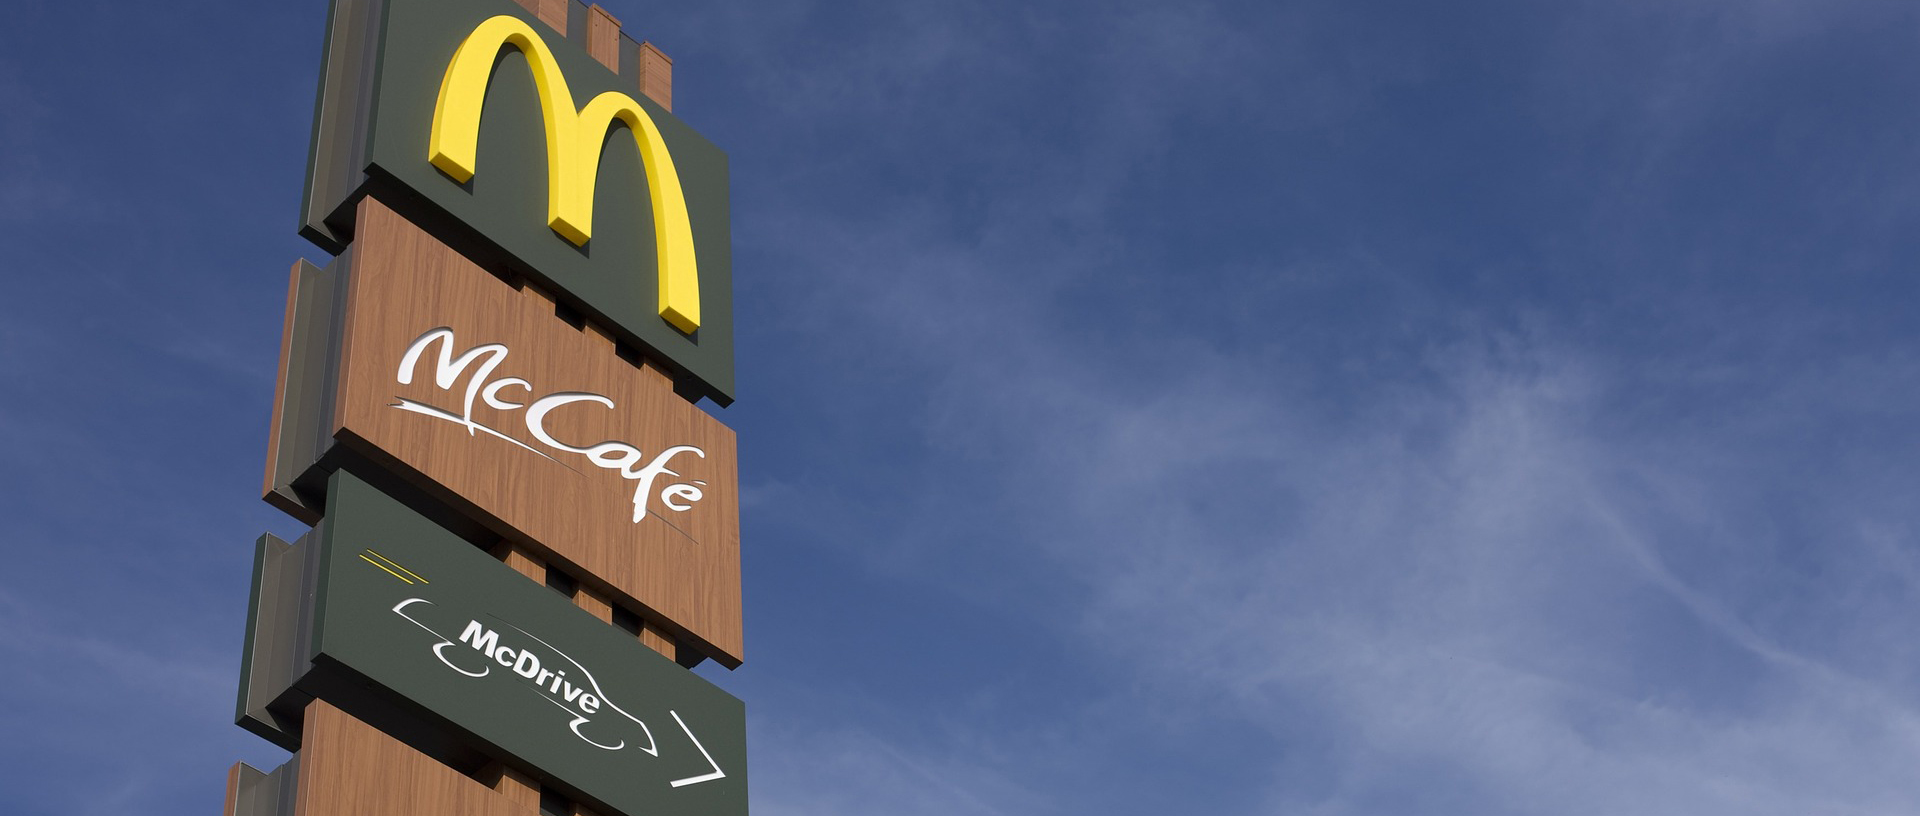 McDonald's Football Nutrition Partnership